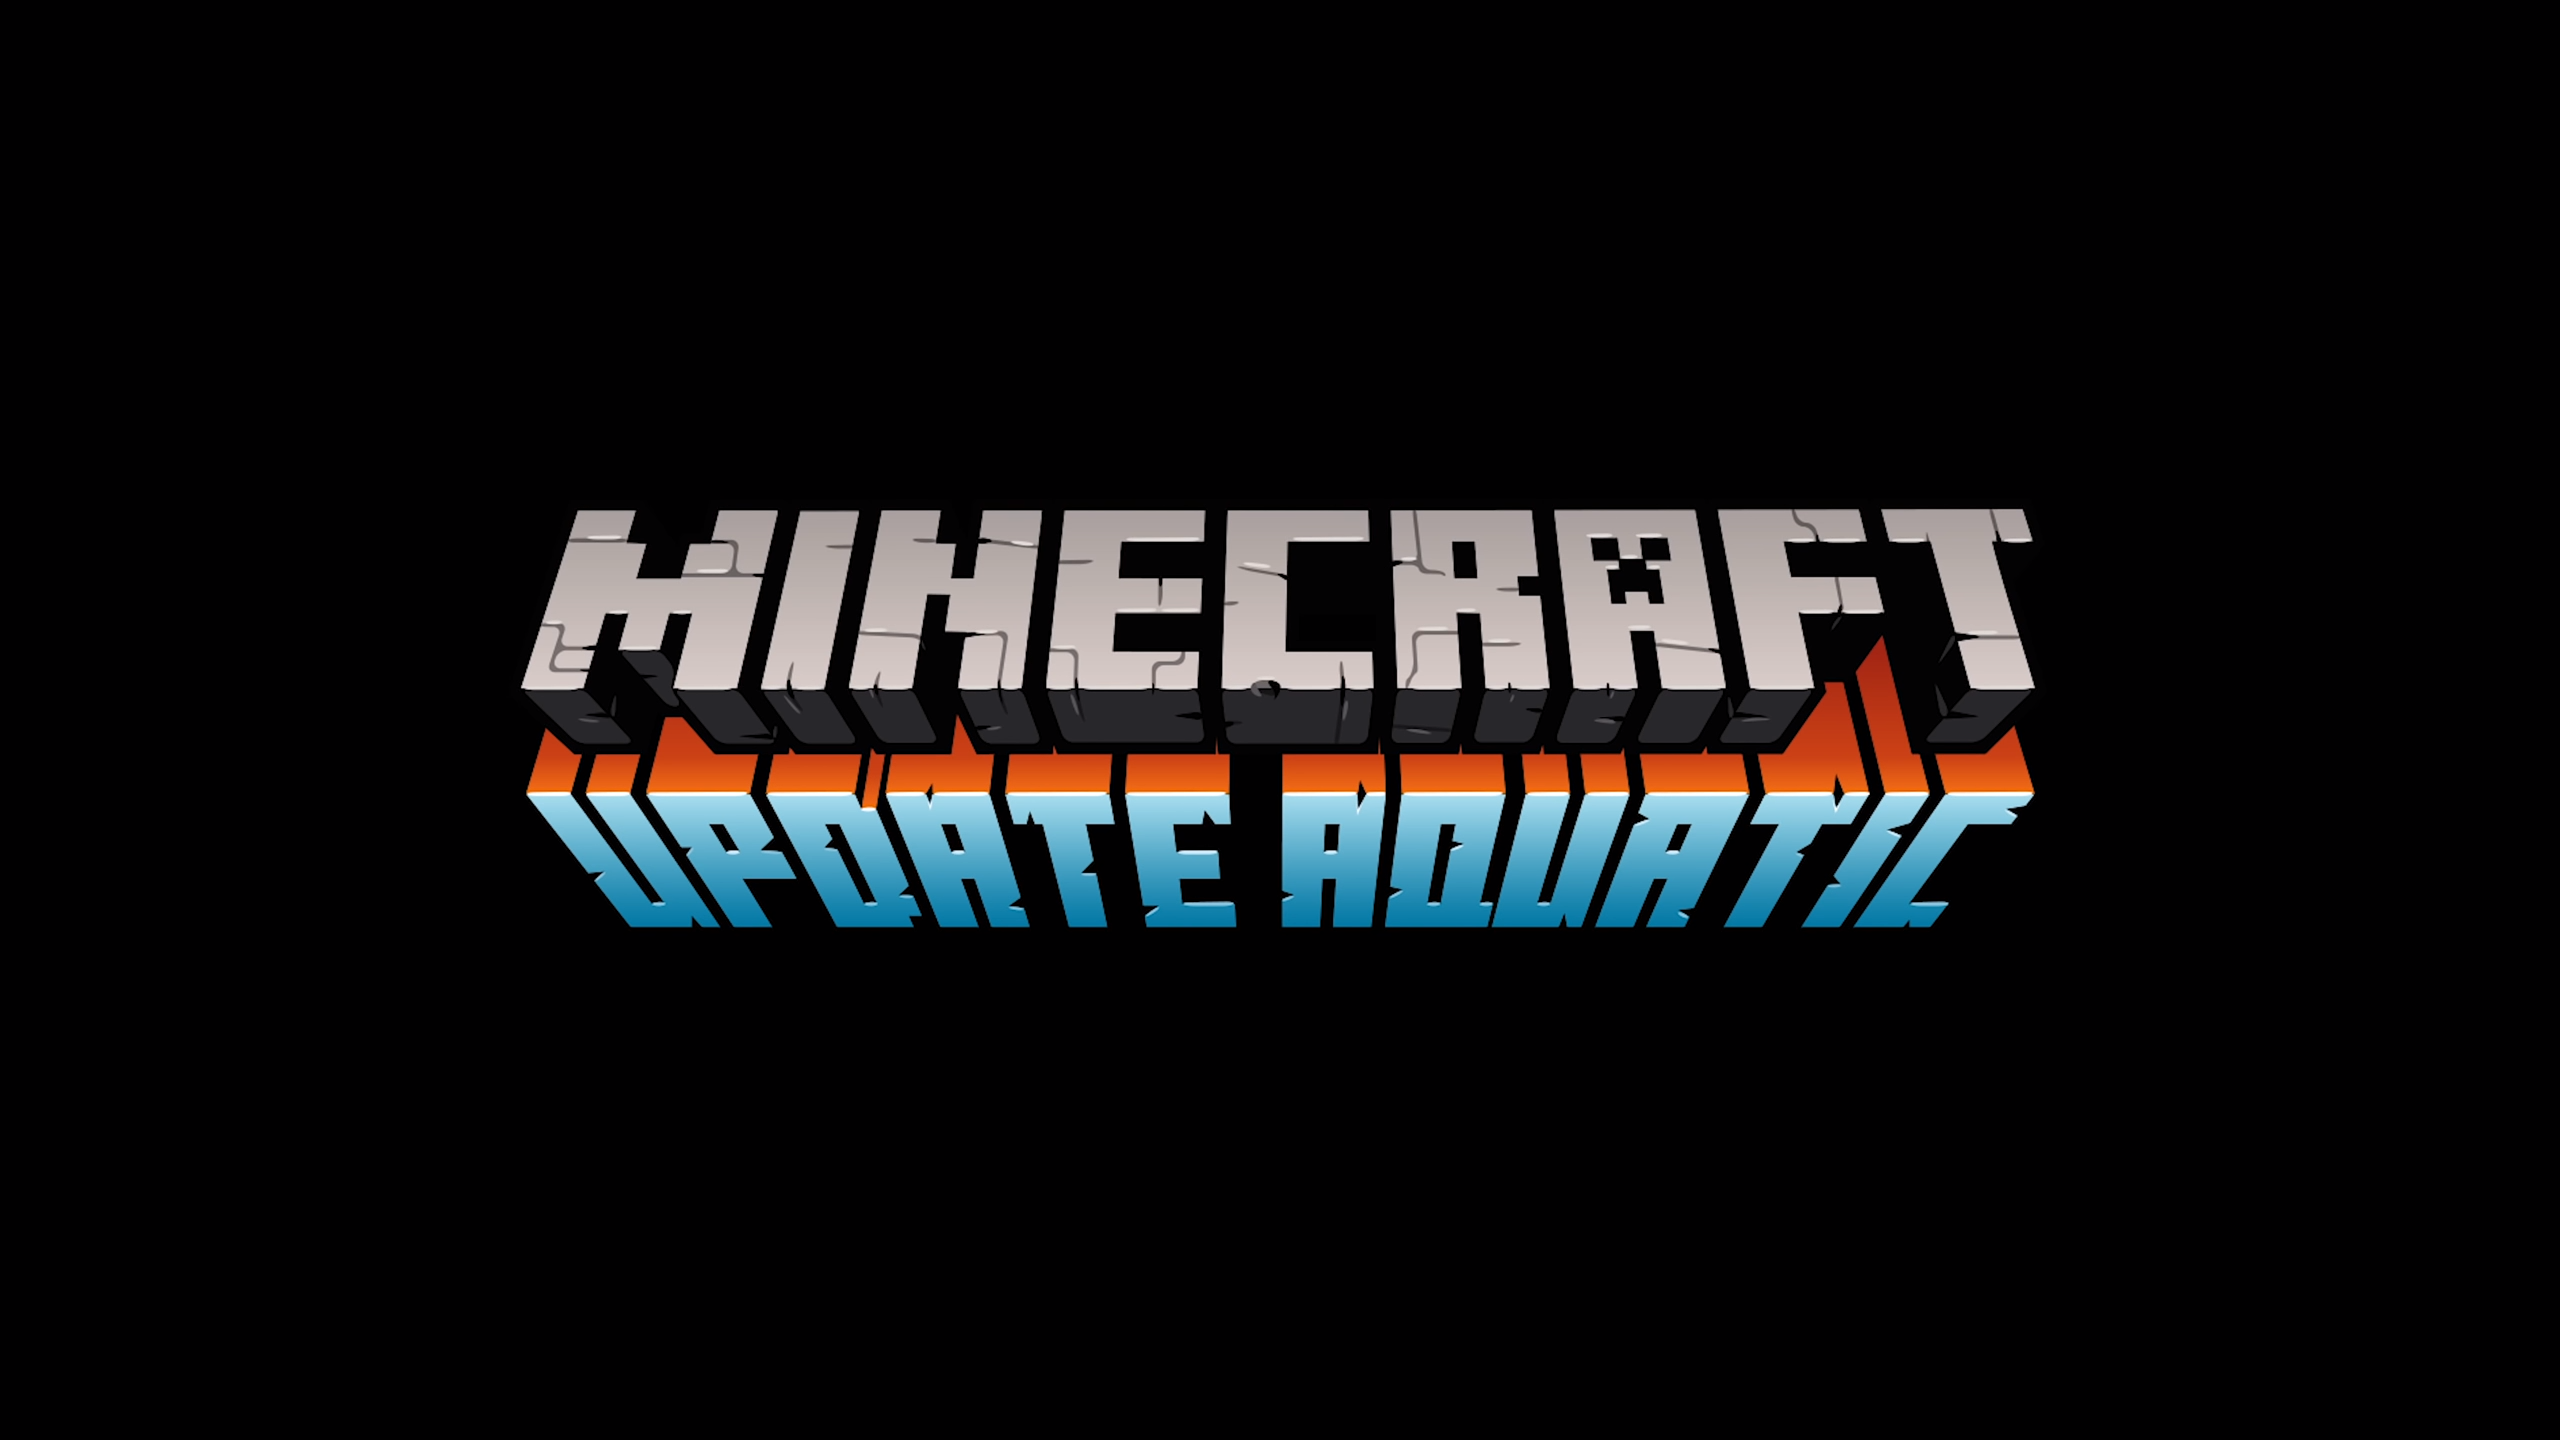 minecraft aquatic update download android